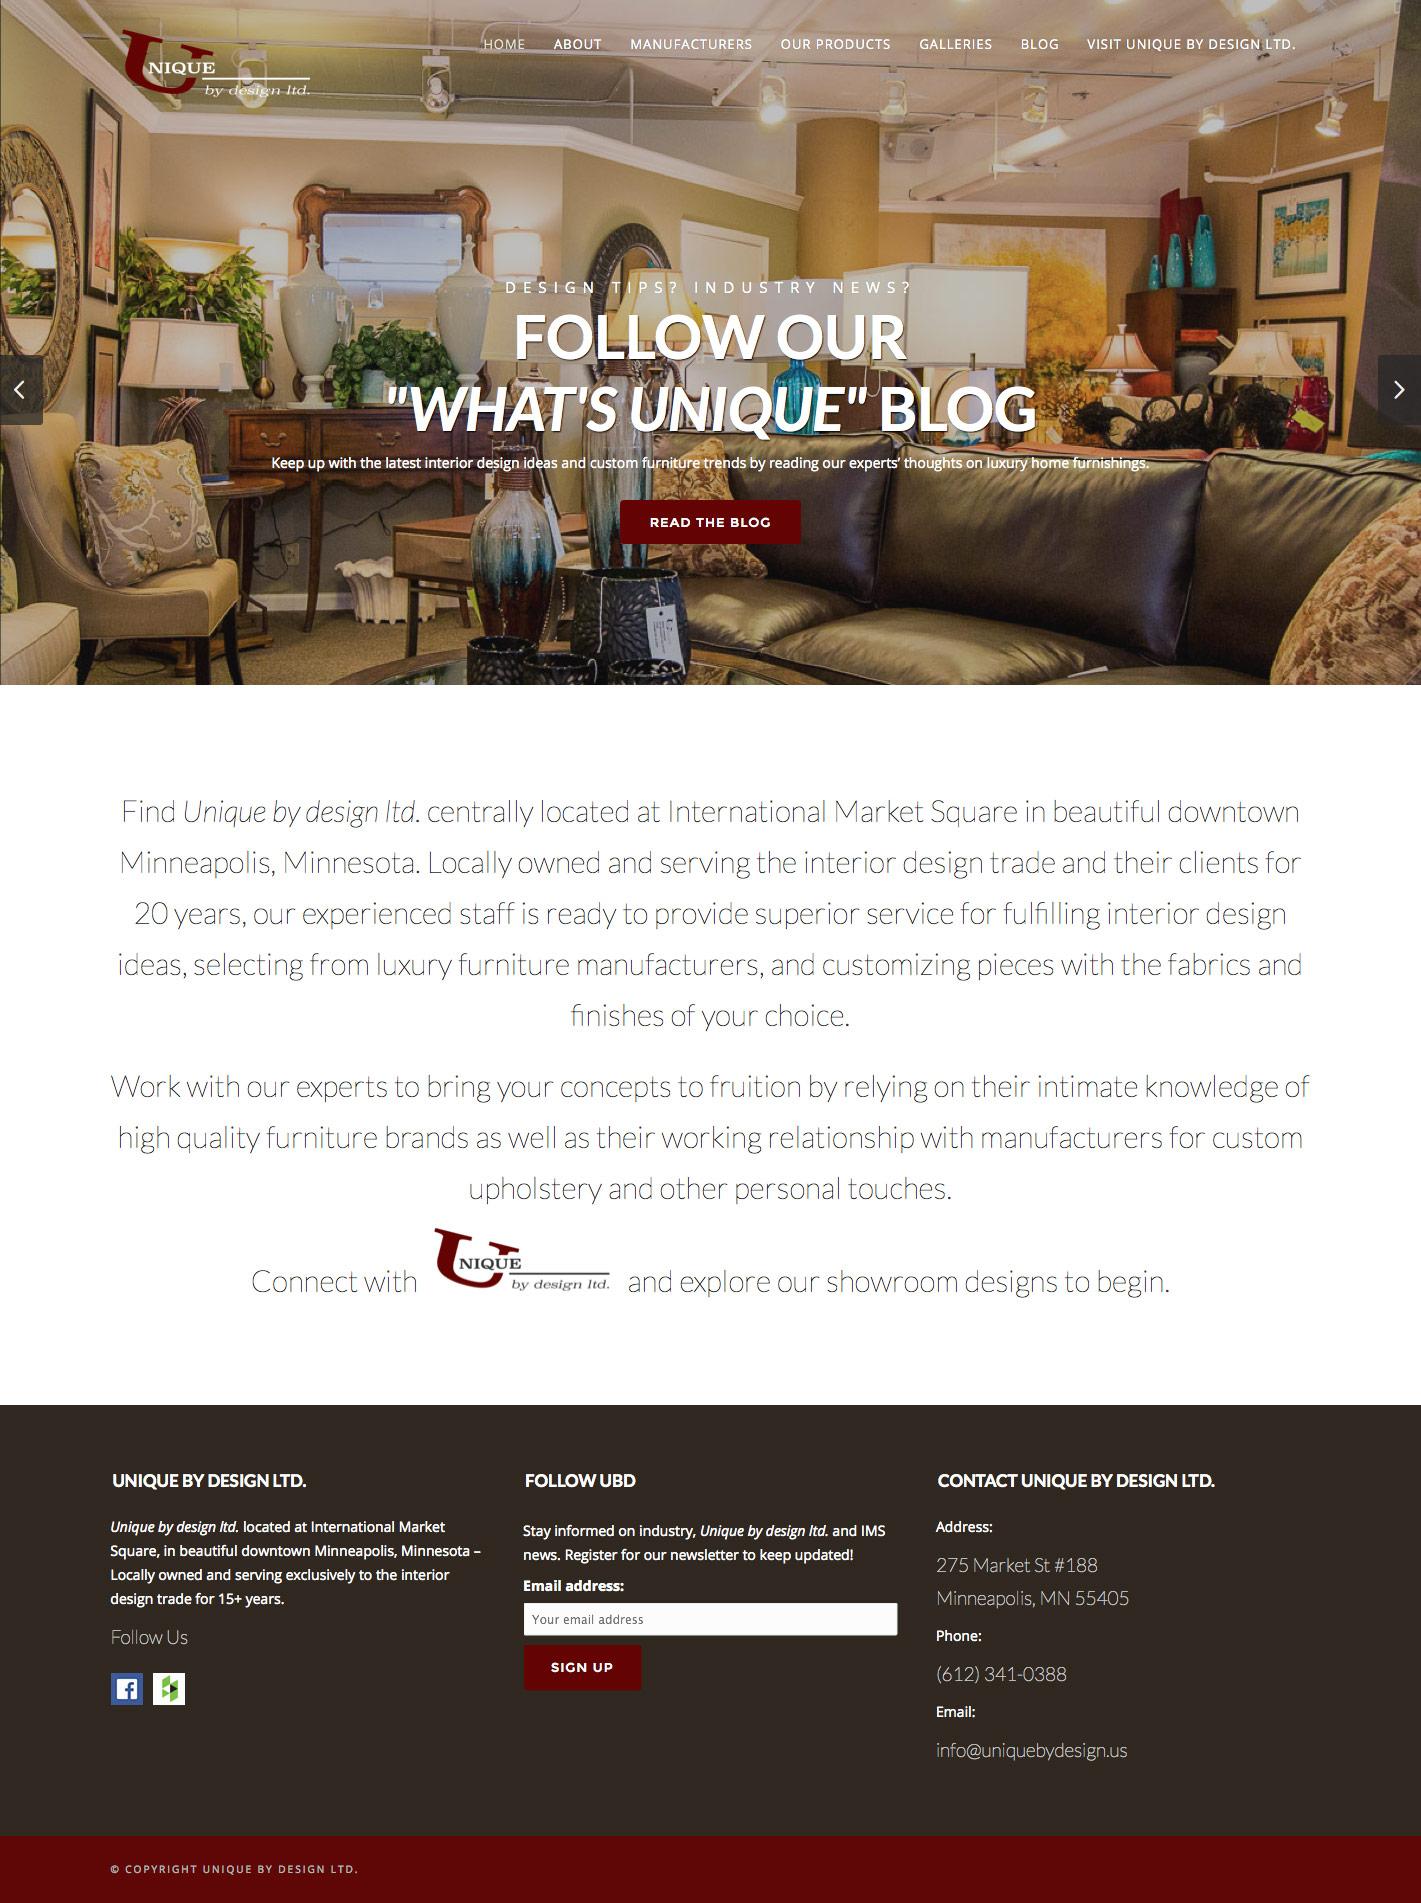 Site Example